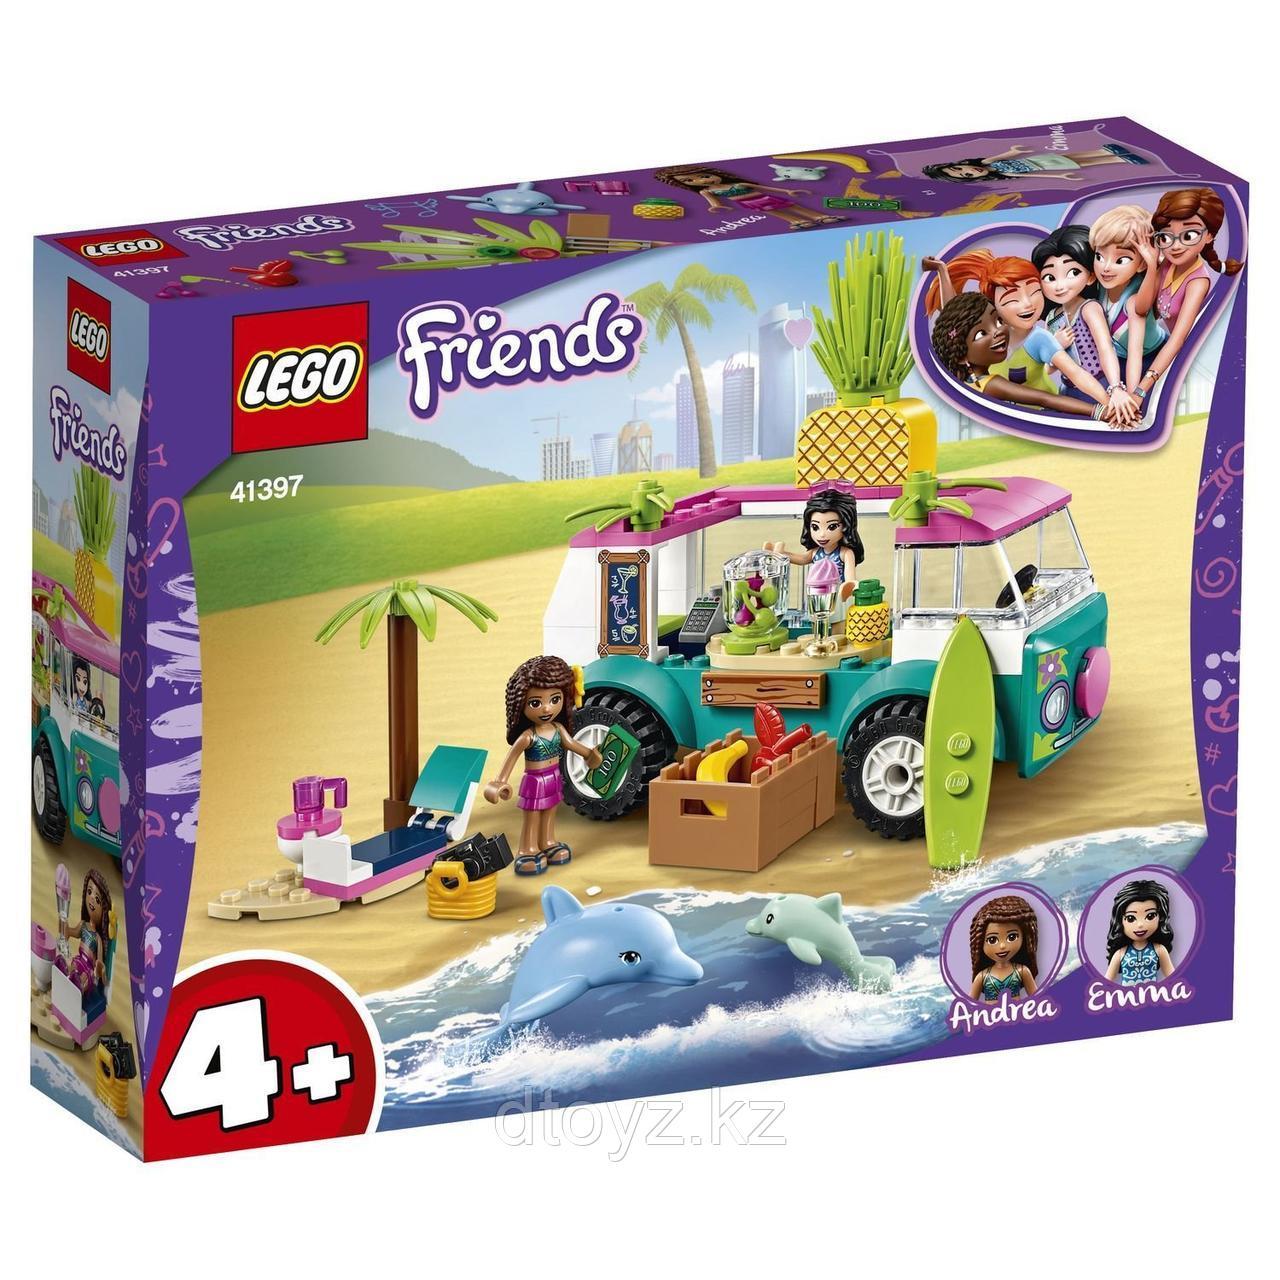 Lego Friends 41397 Фургон-бар для приготовления сока